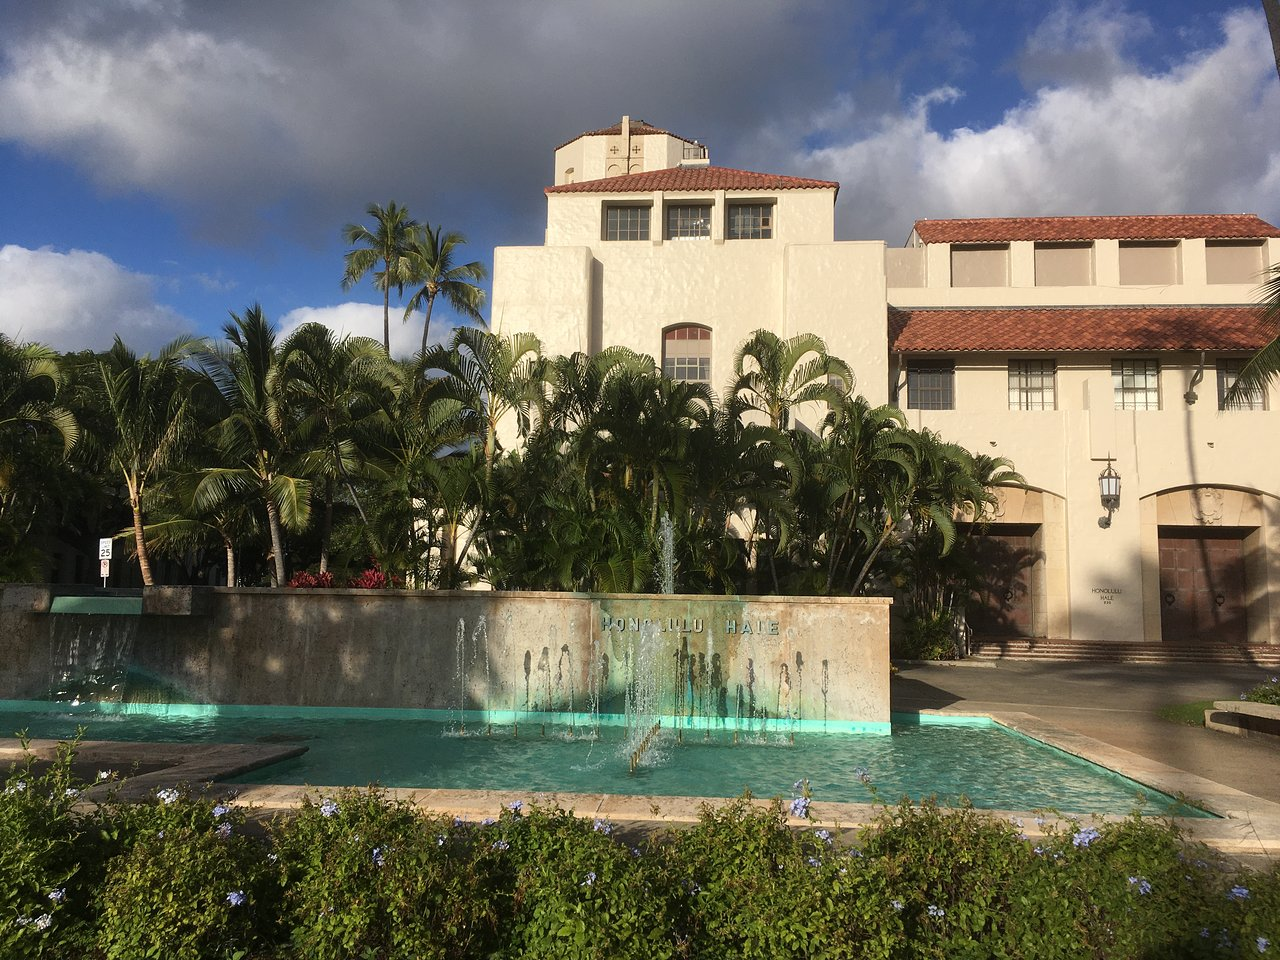 Contea Di Honolulu Hawaii honolulu hale (city hall) - tripadvisor